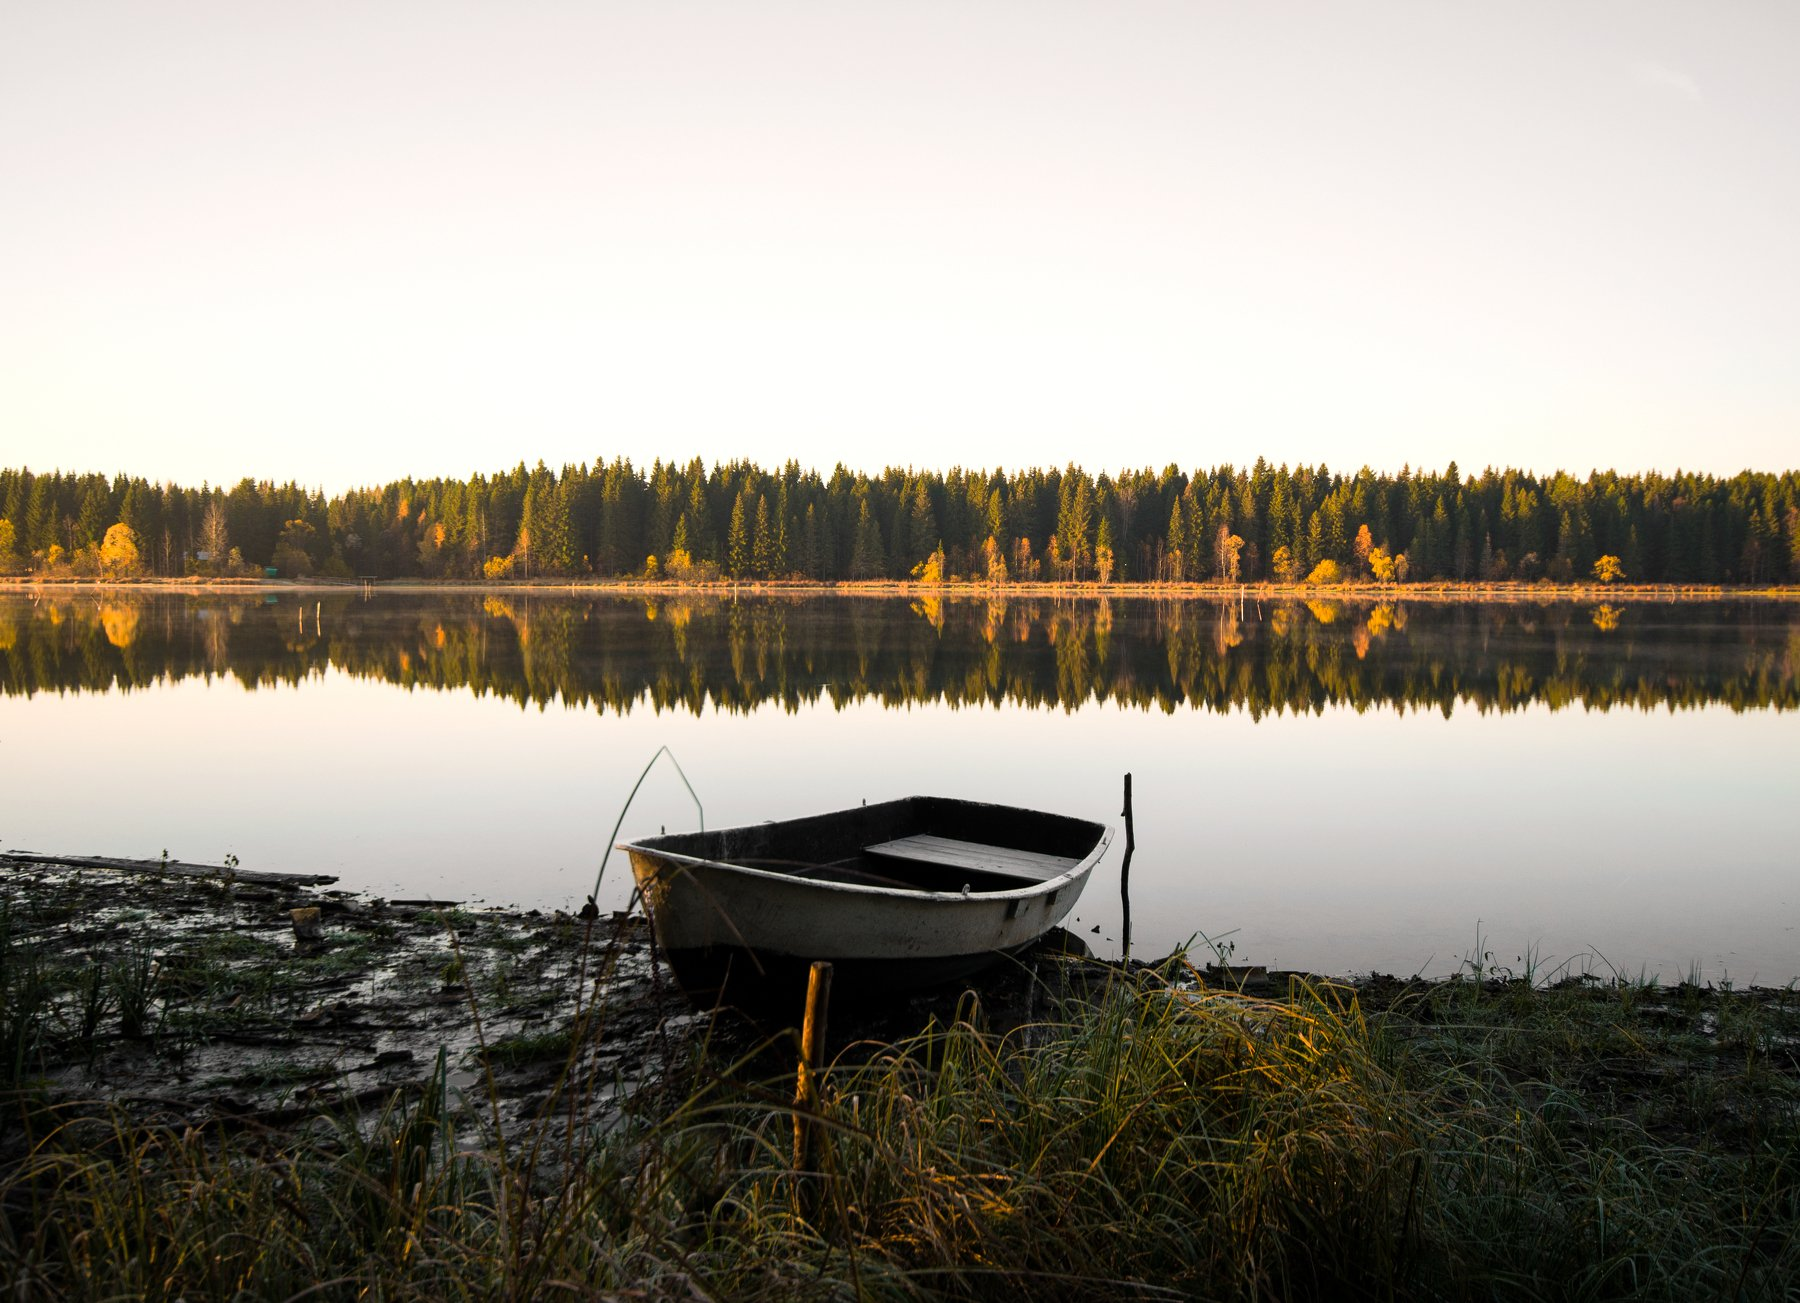 осень,утро,природа, Карепанов Евгений